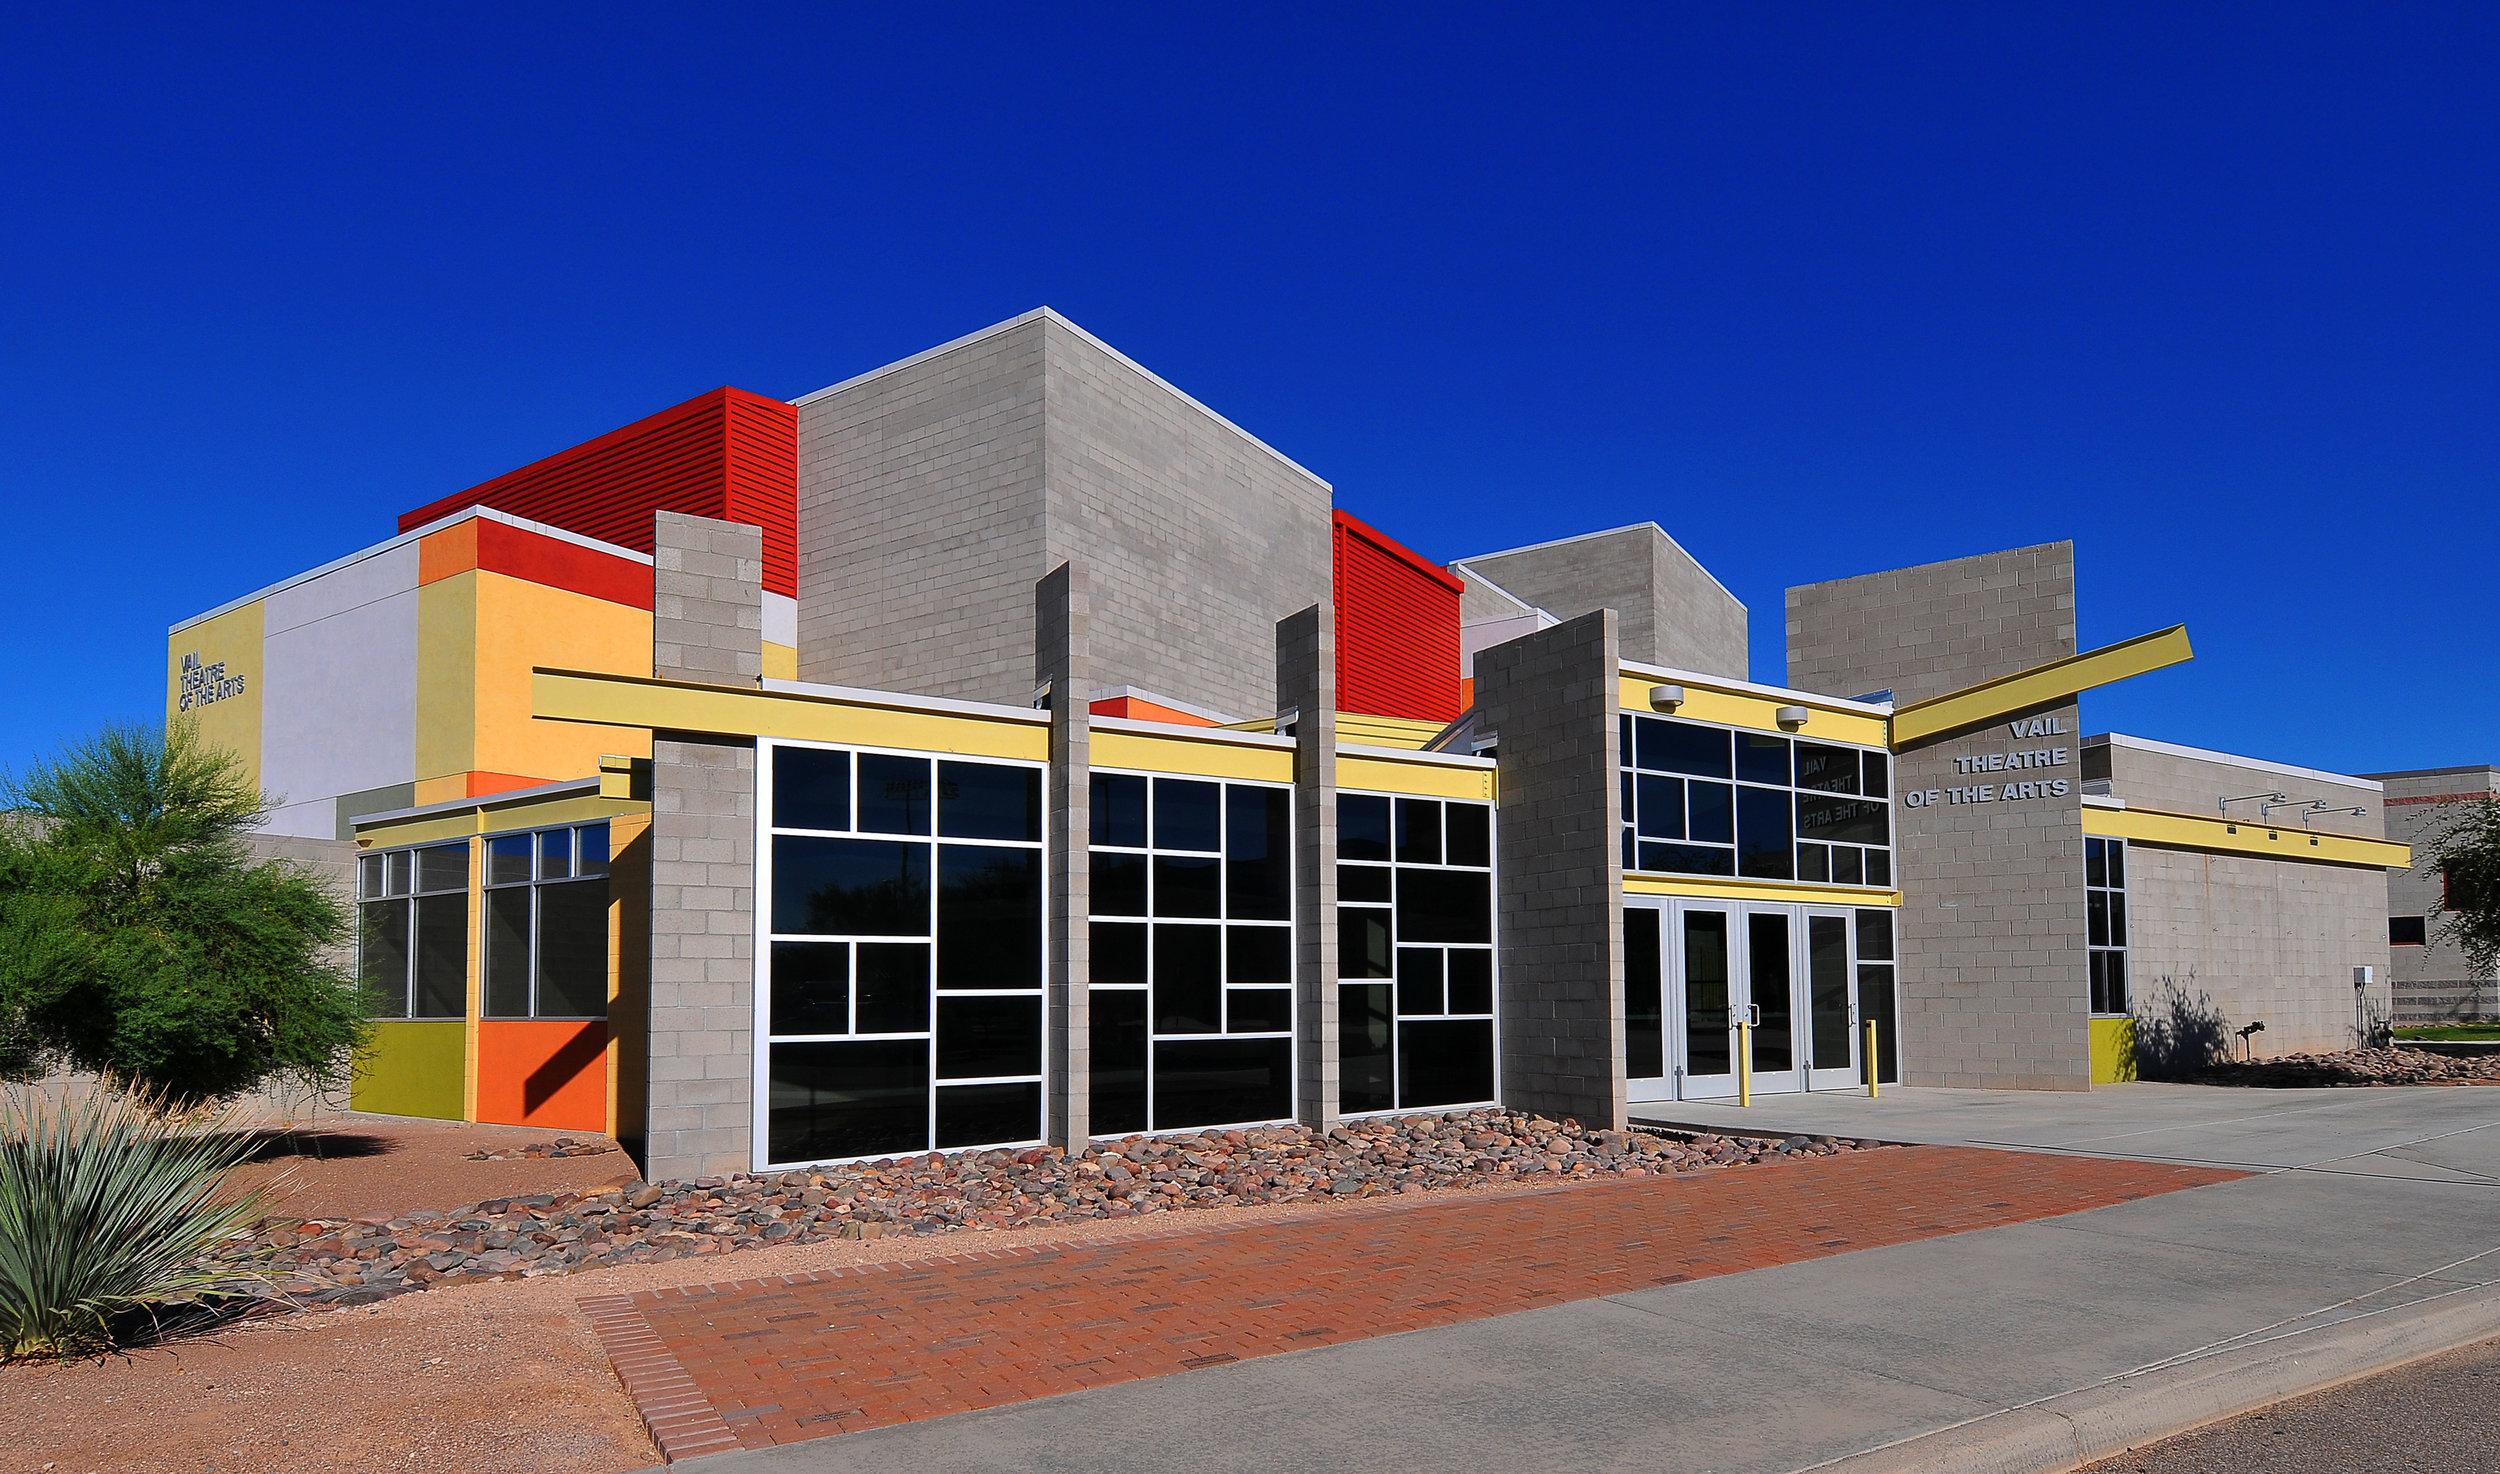 Vail Theater of the Arts (VTOTA) - Tucson, AZ